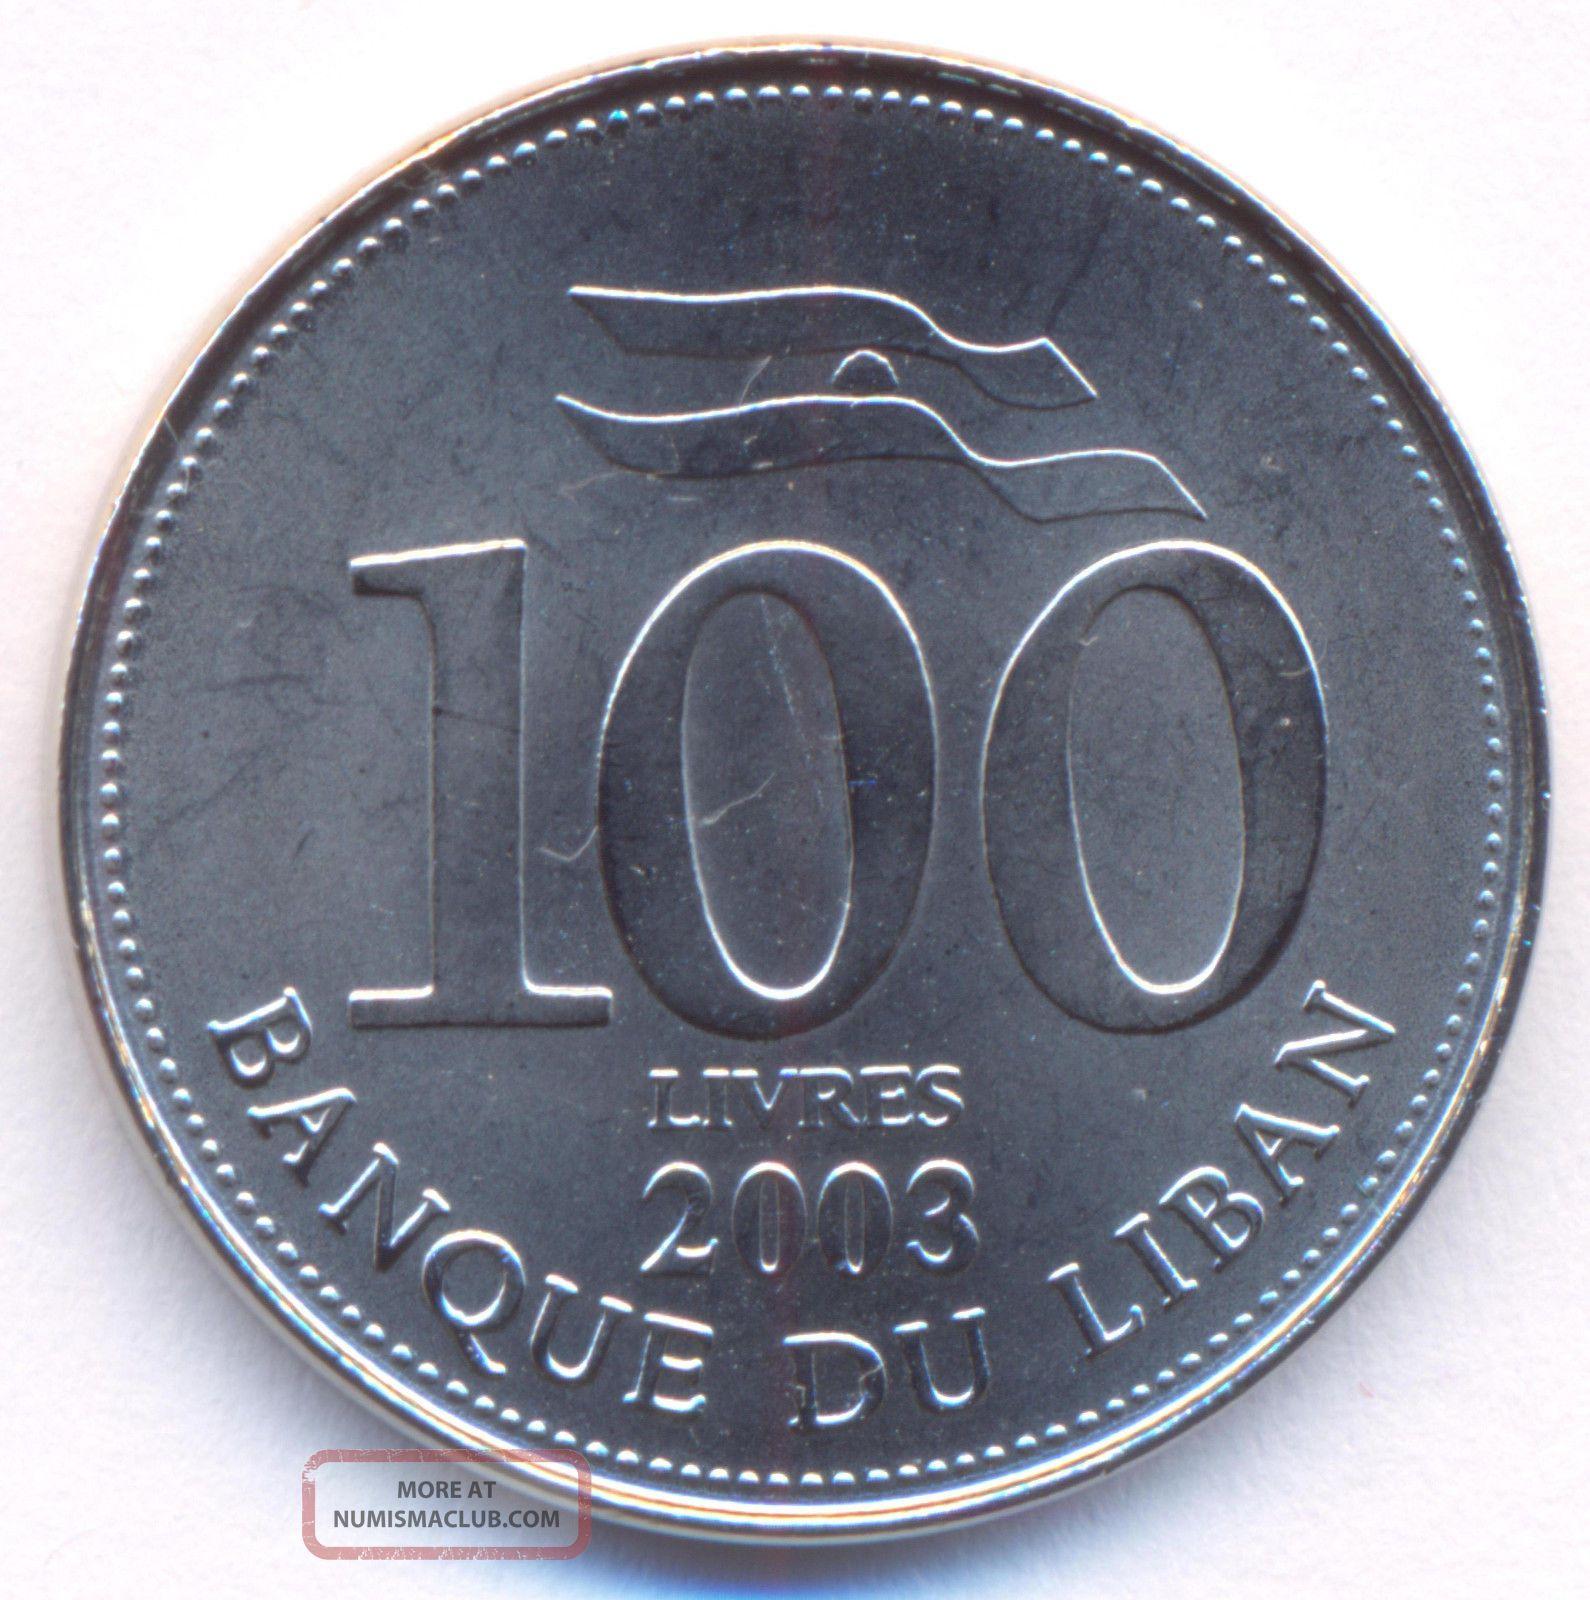 Lebanon,  100 Livres,  A.  D.  2003,  Uncirculated Lebanon photo